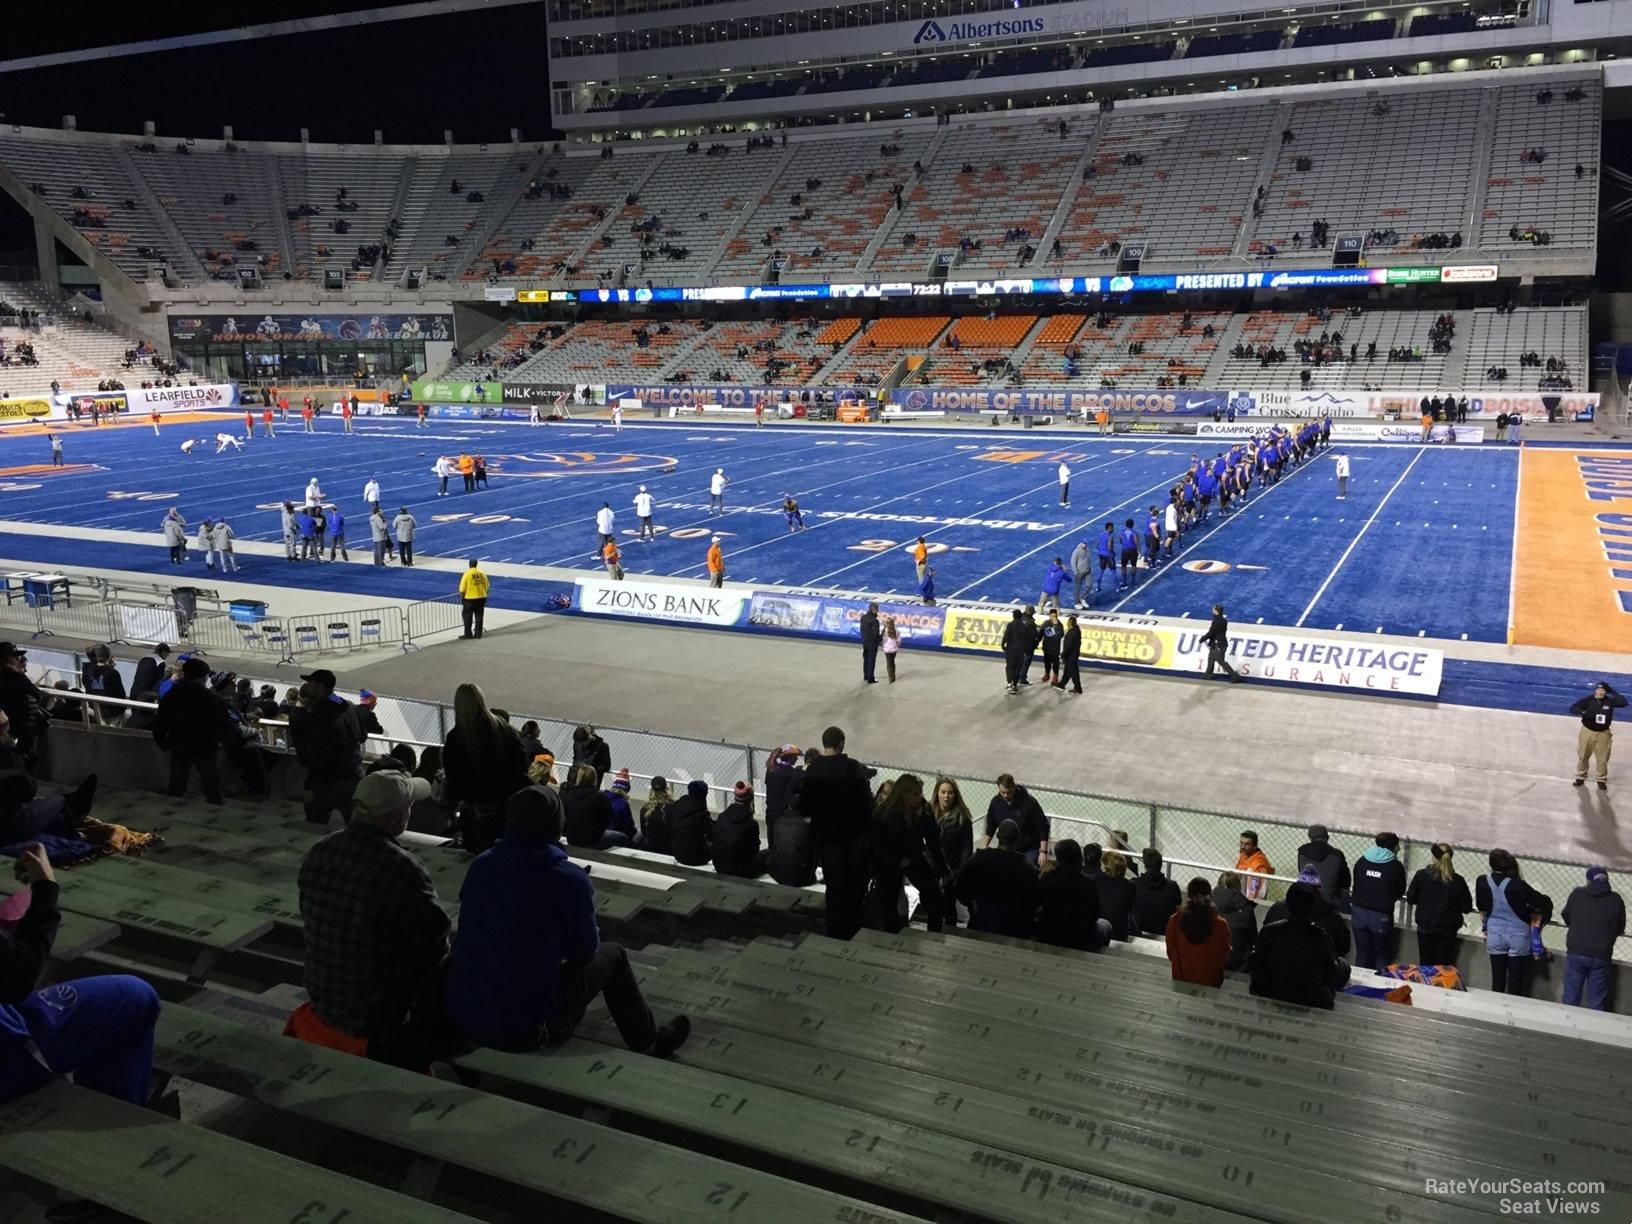 Section 20 at Bronco Stadium - RateYourSeats.com